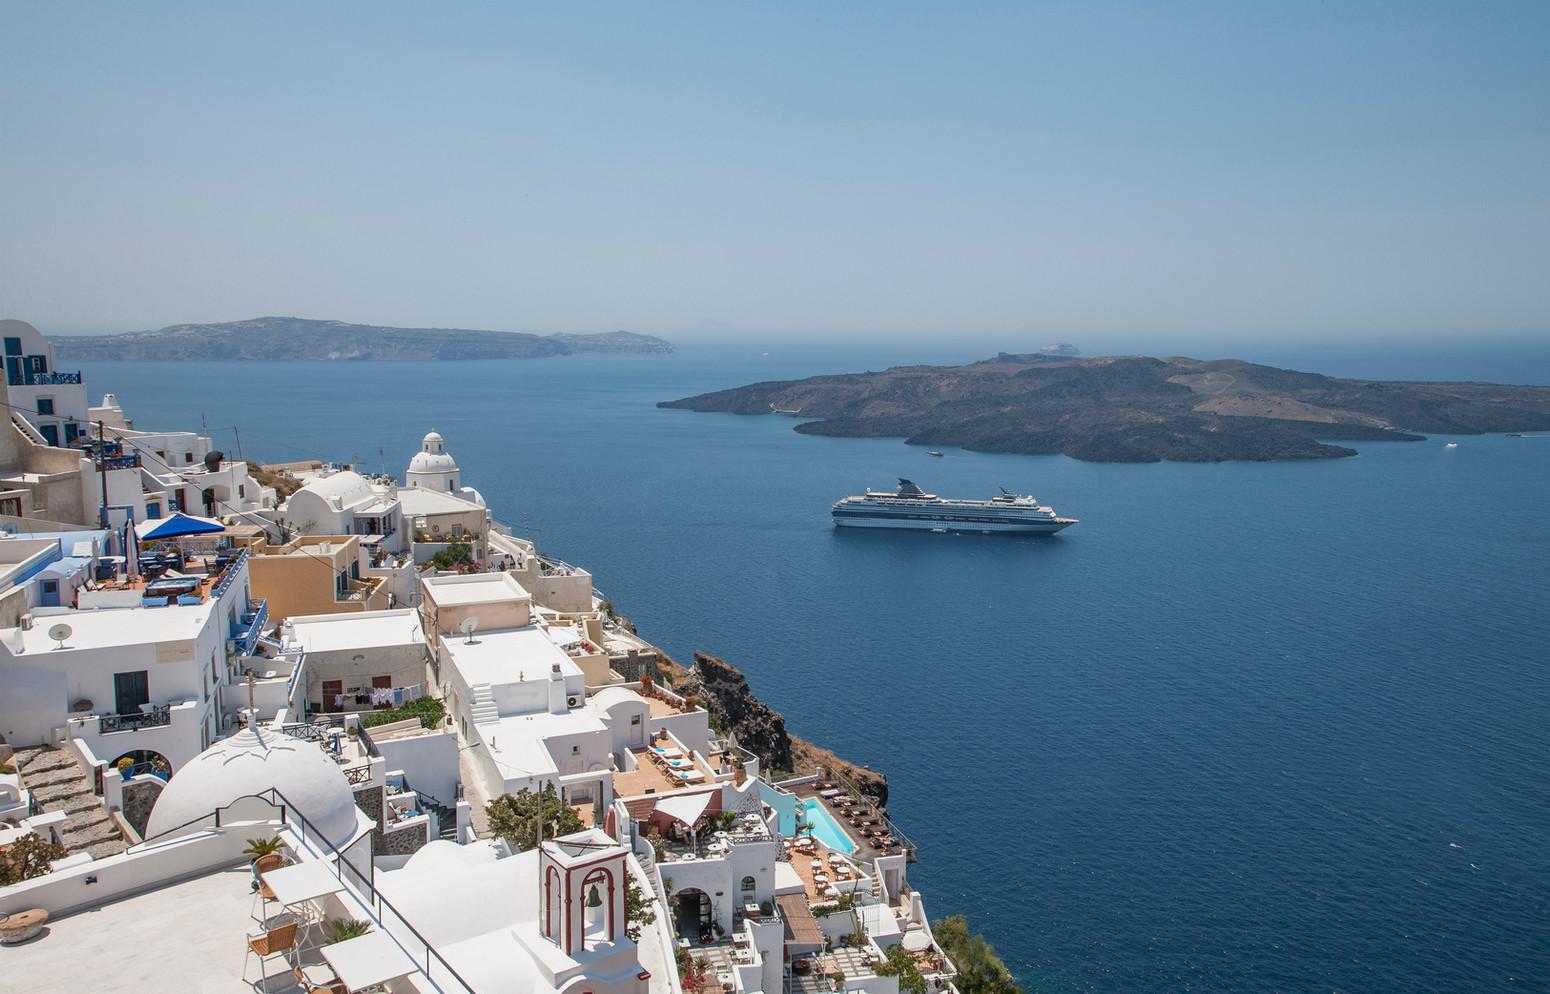 Cruising the Greek Isles